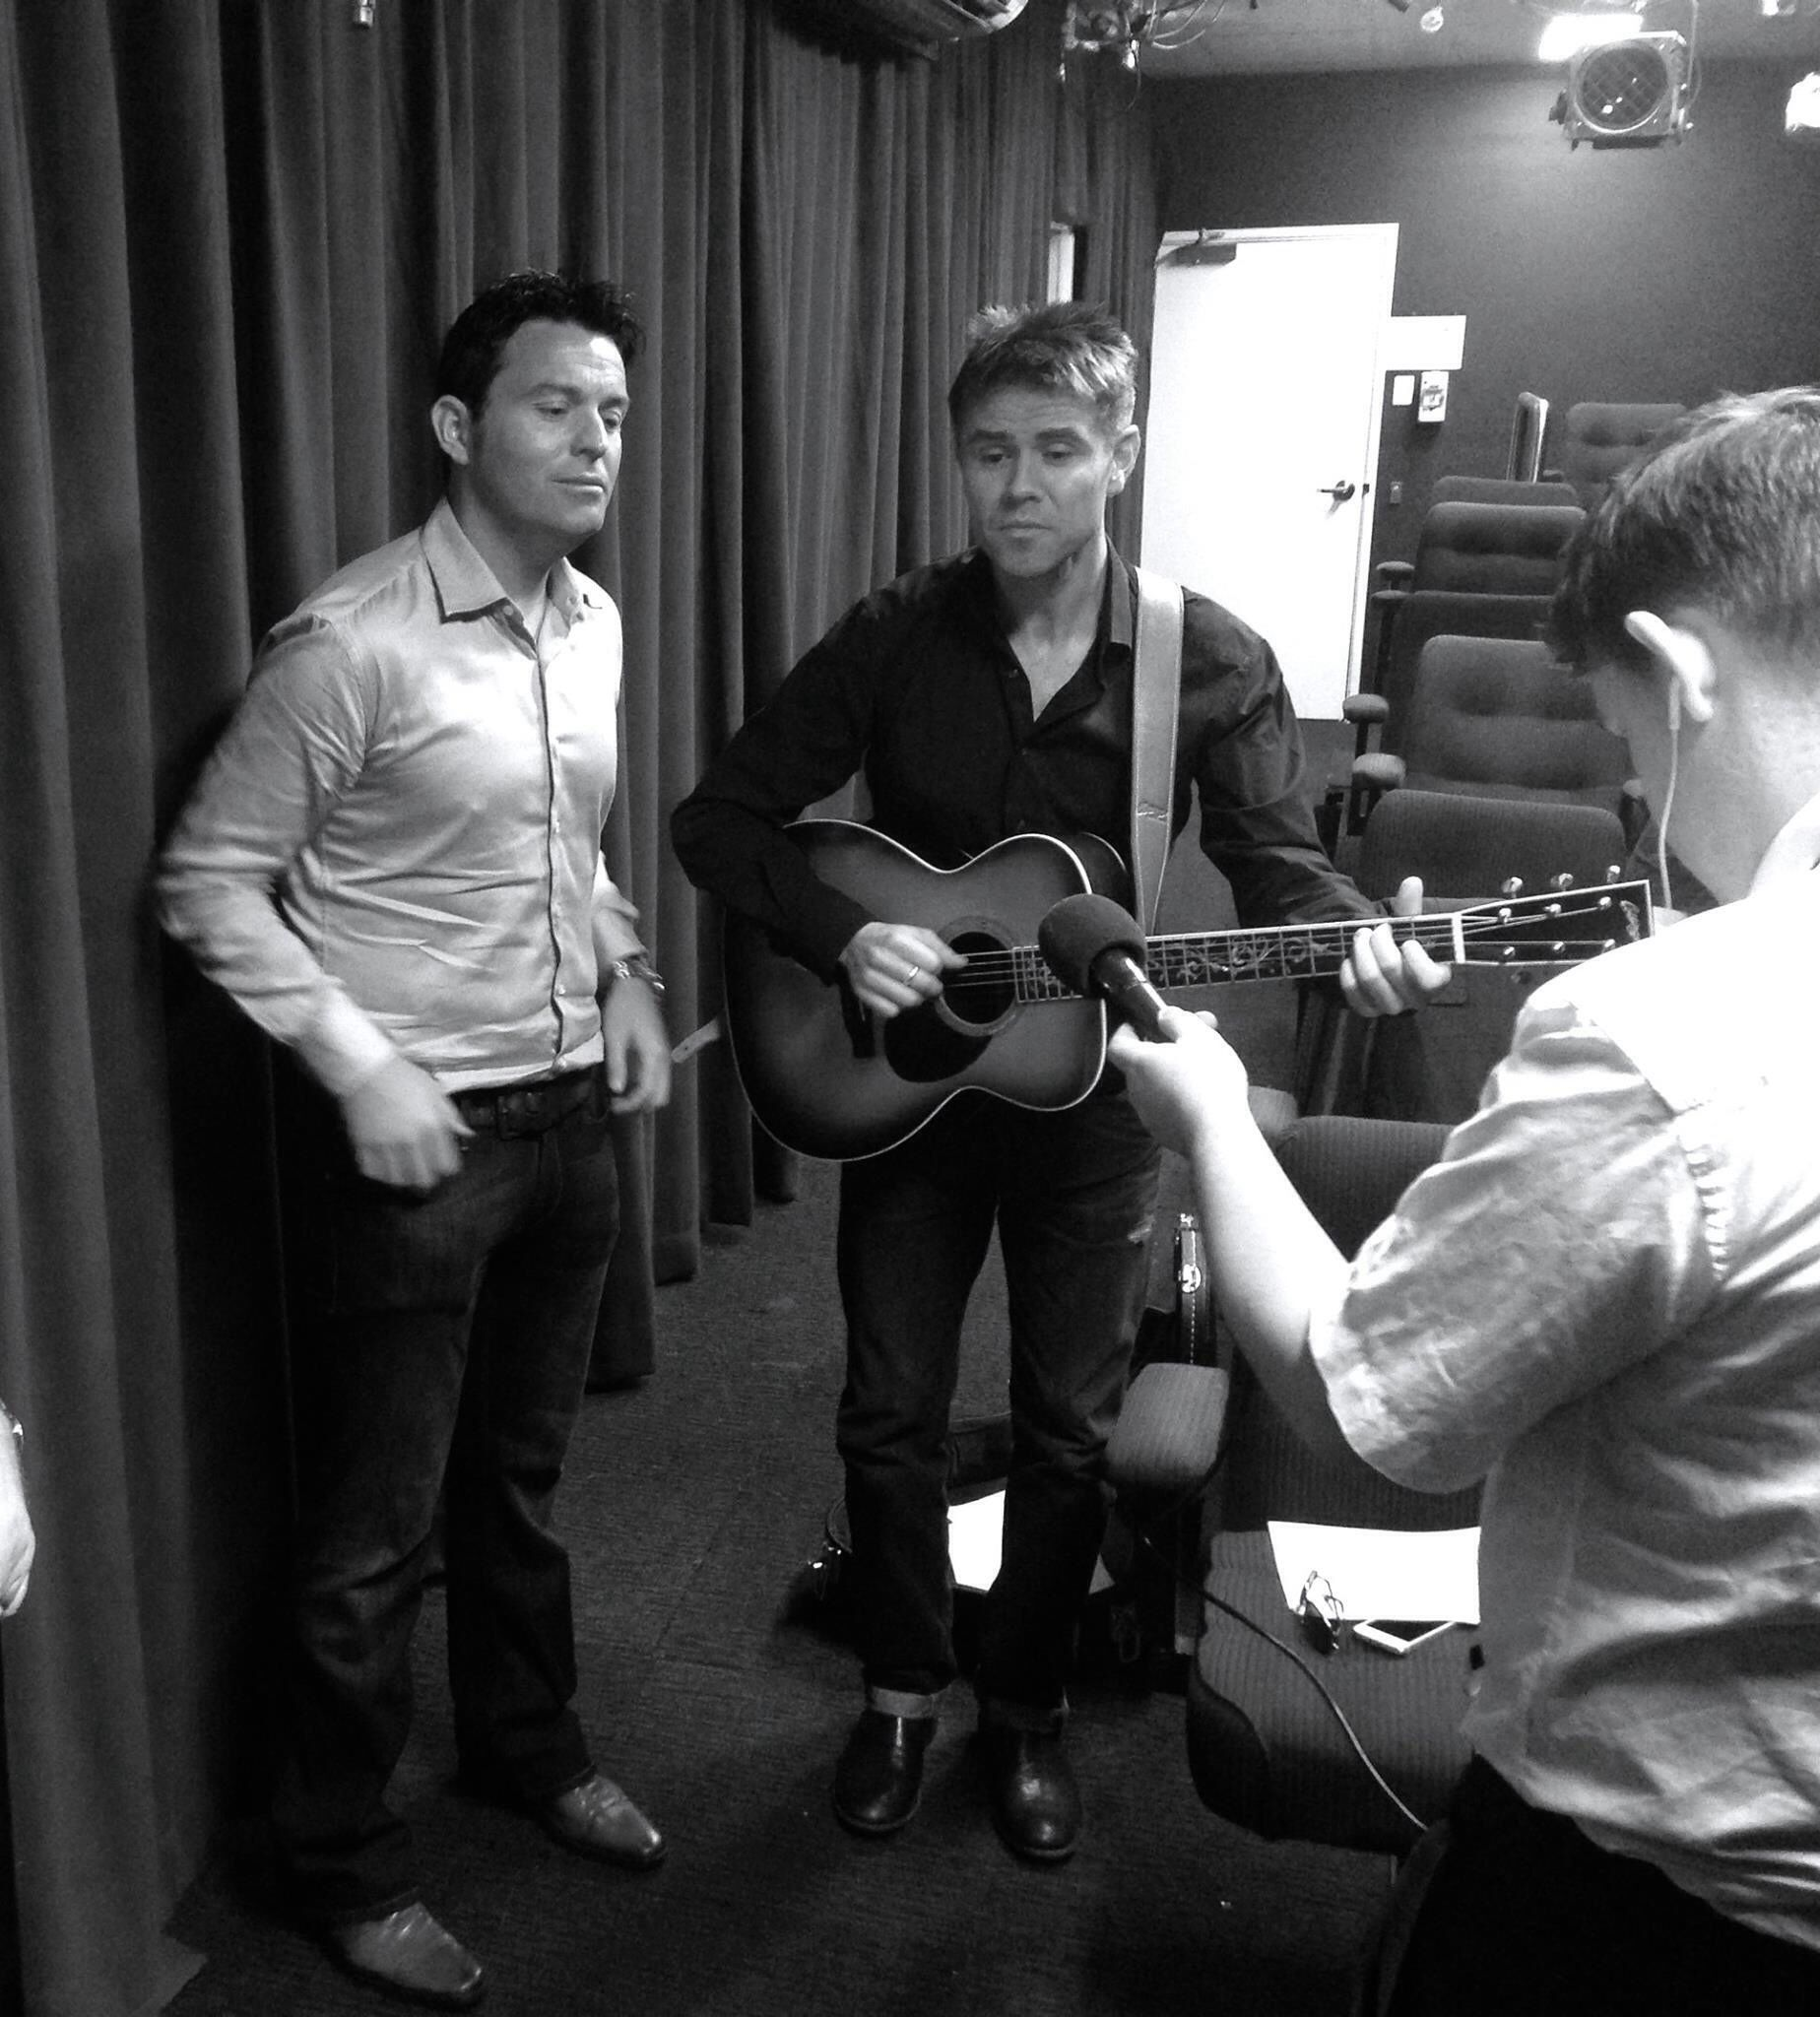 Ryan and Neil rehearsing in Australia